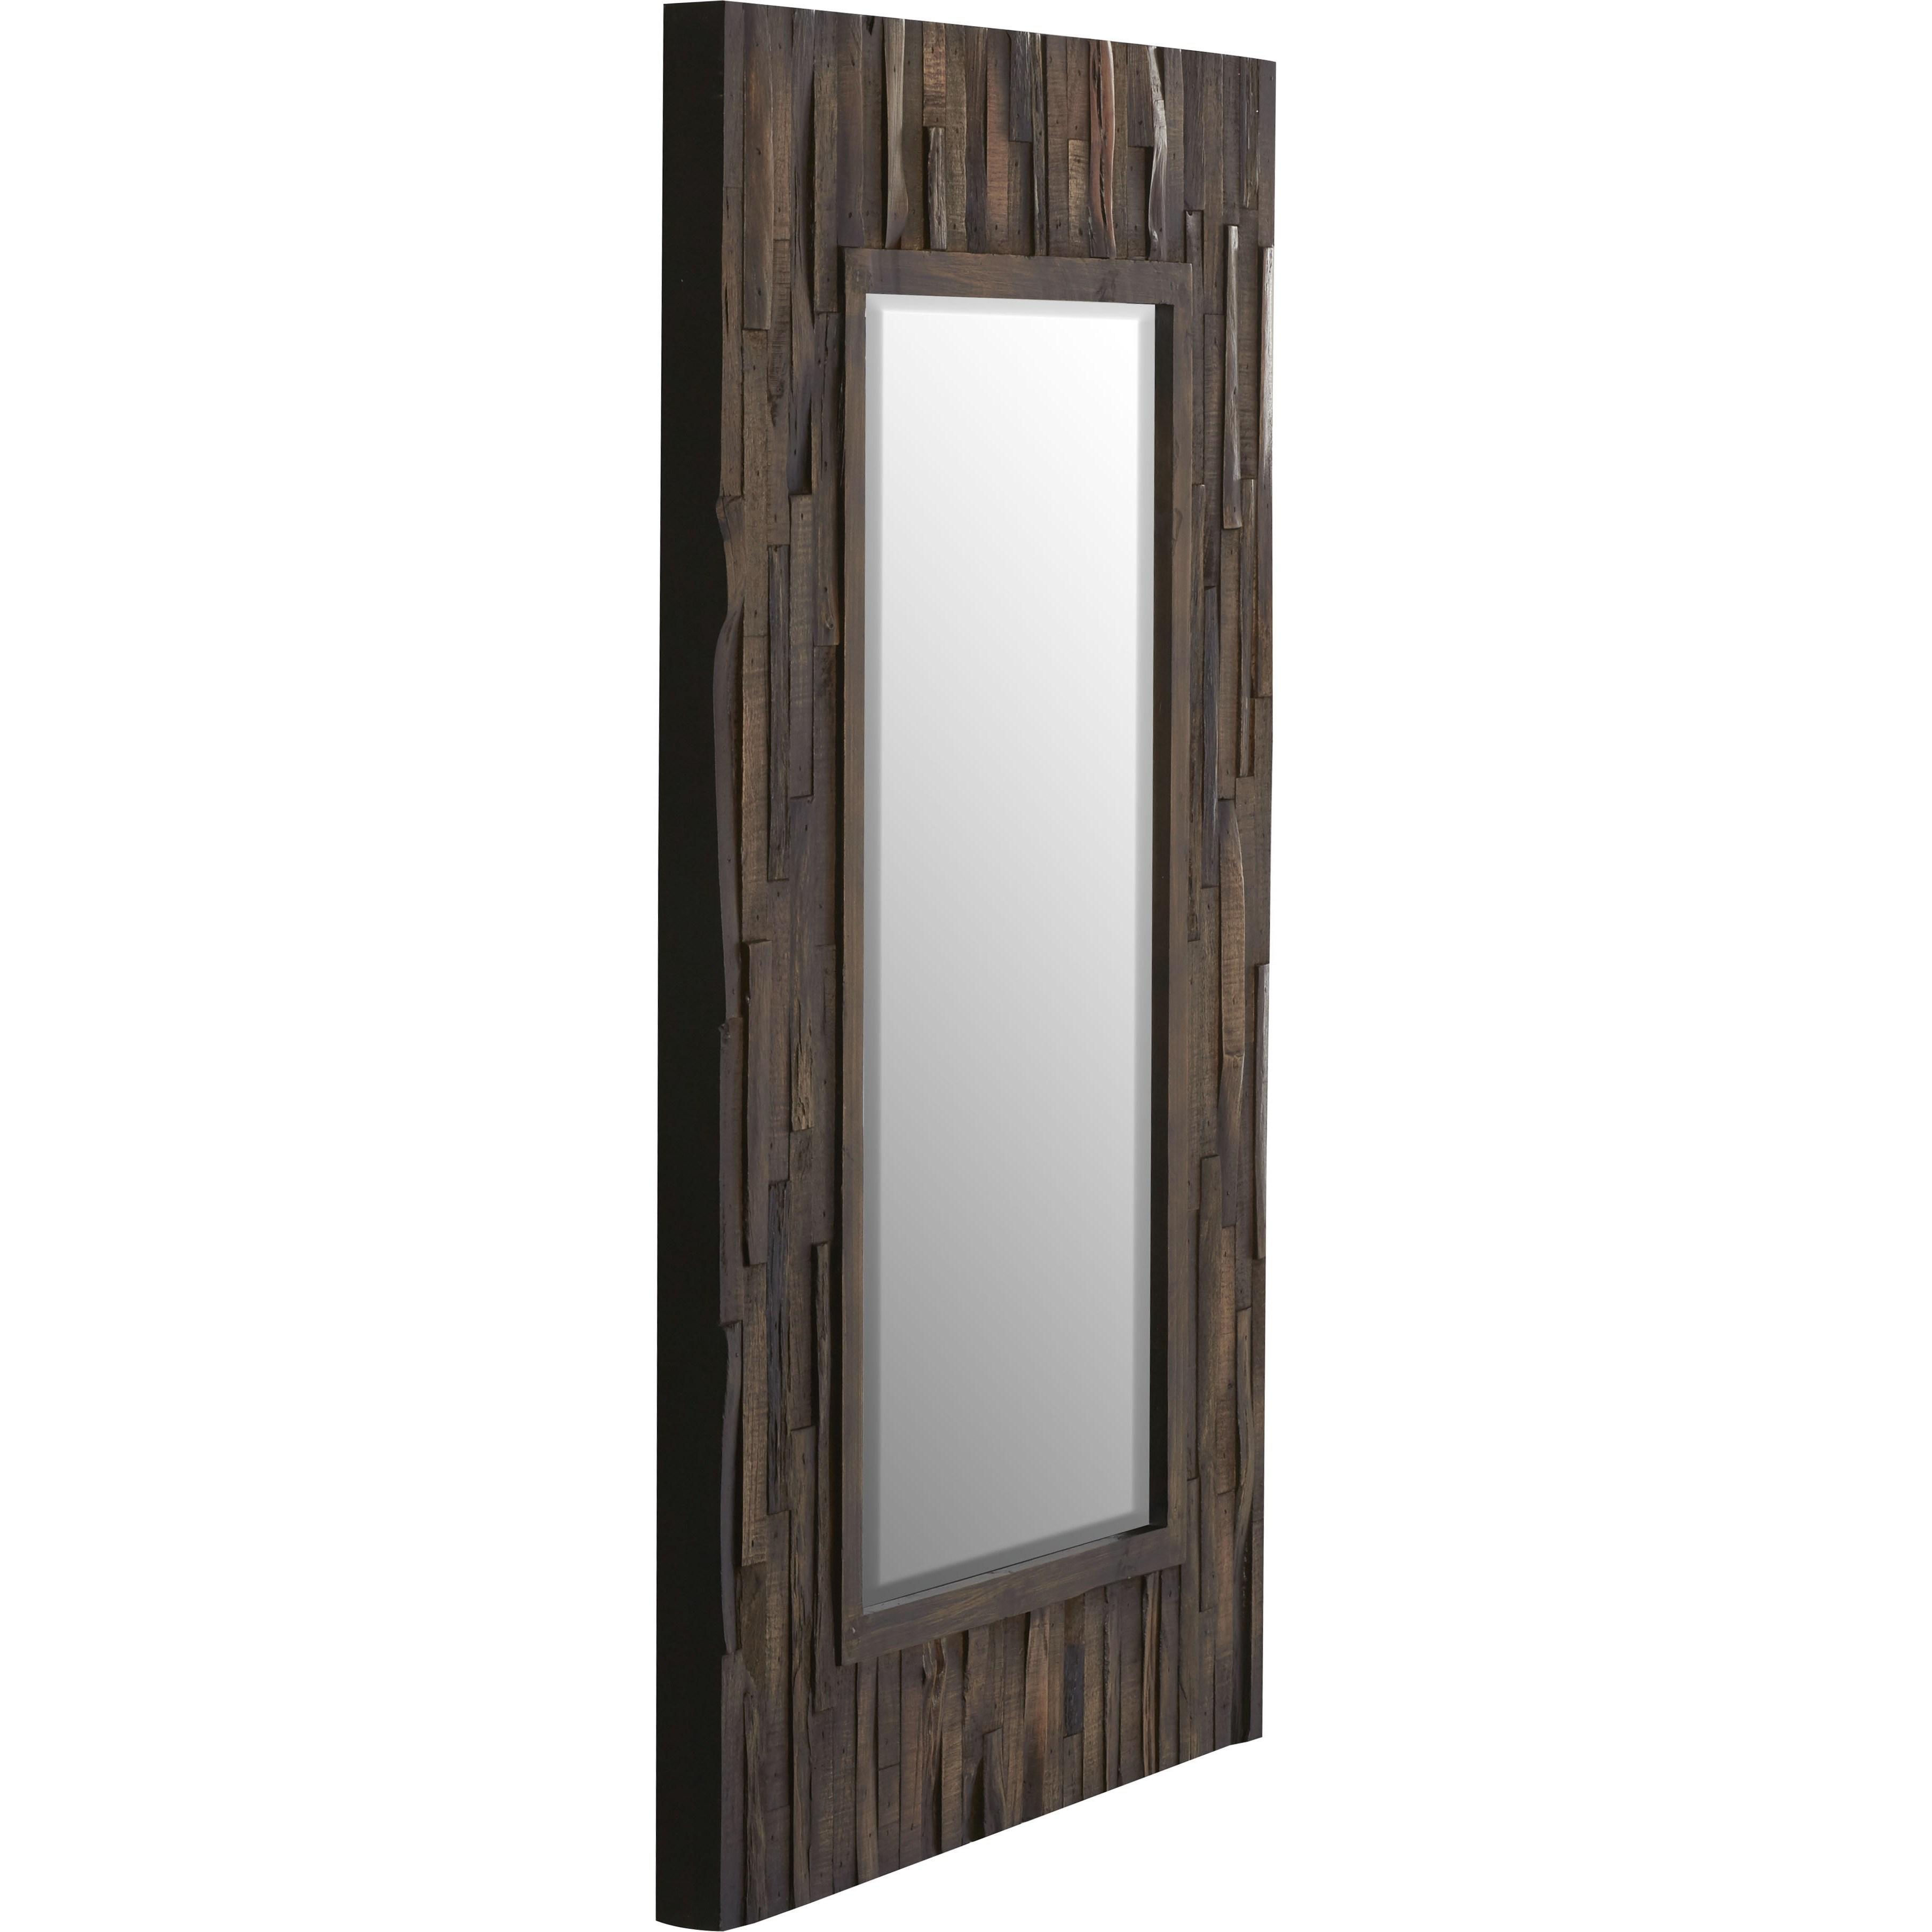 Rectangular Wall Mirrors – Pmpresssecretariat Throughout Janie Rectangular Wall Mirrors (Image 15 of 20)